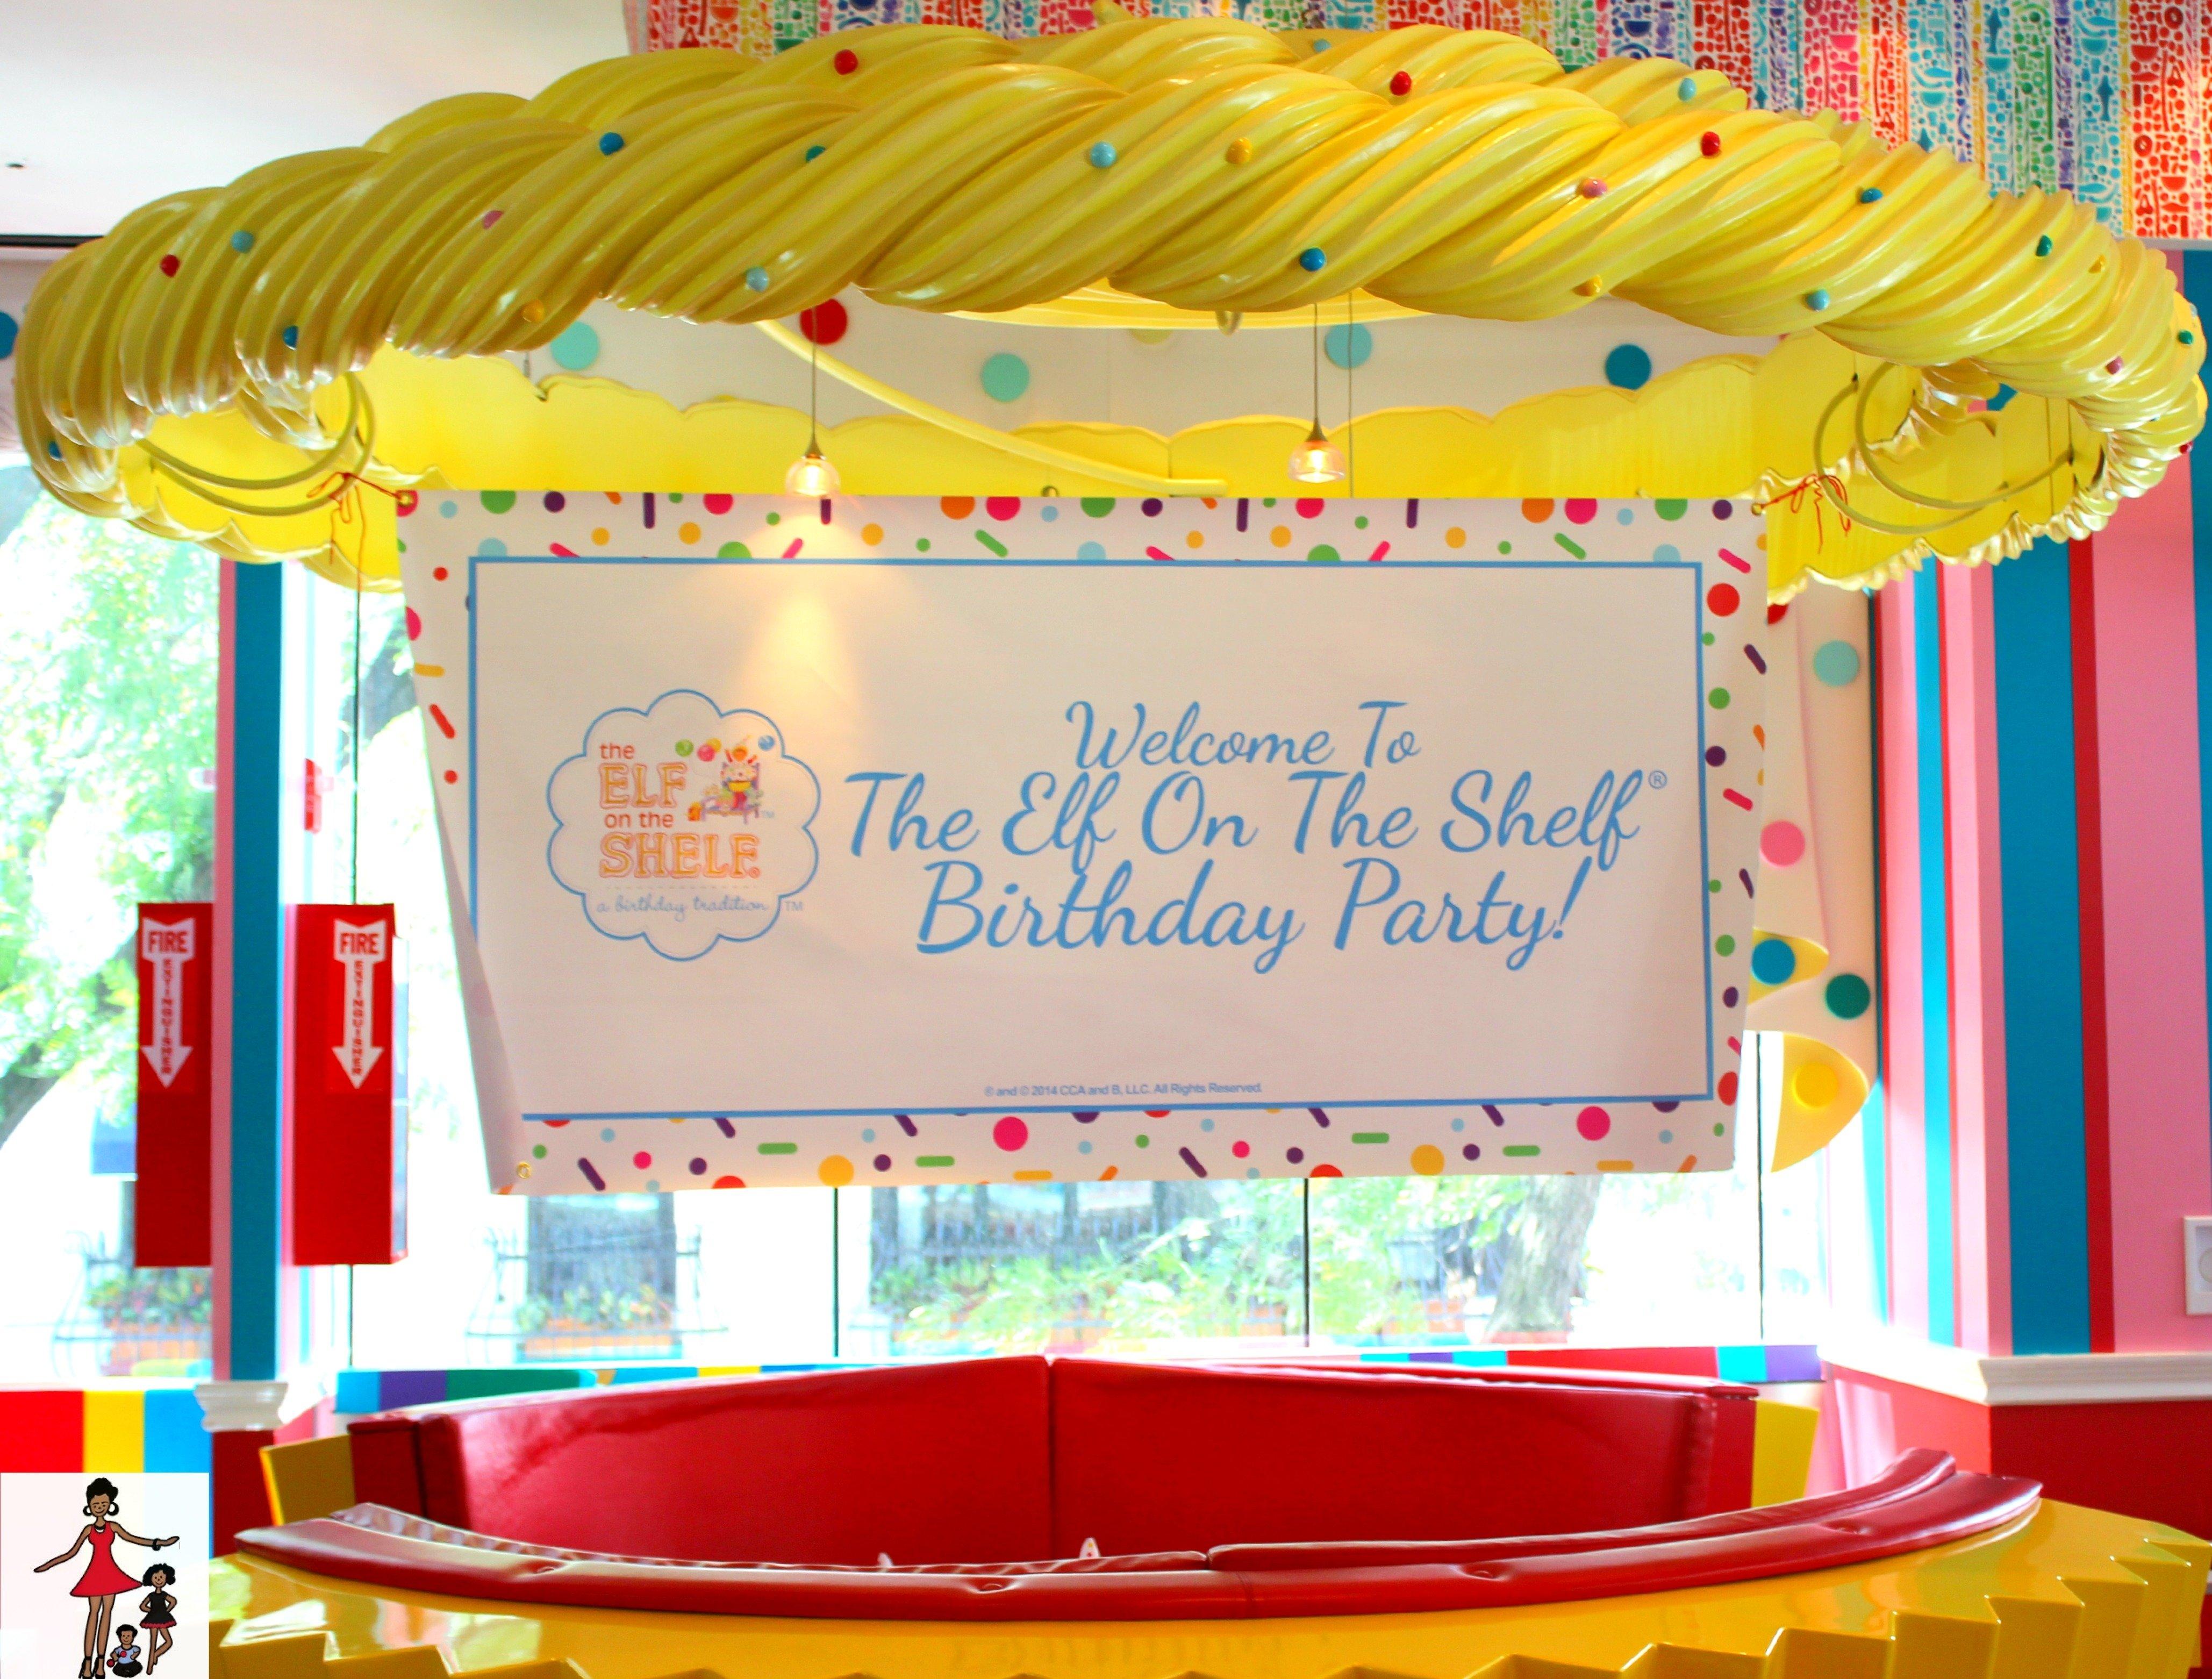 10 Best Elf On The Shelf Birthday Ideas the elf on the shelf birthday tradition rattles heels